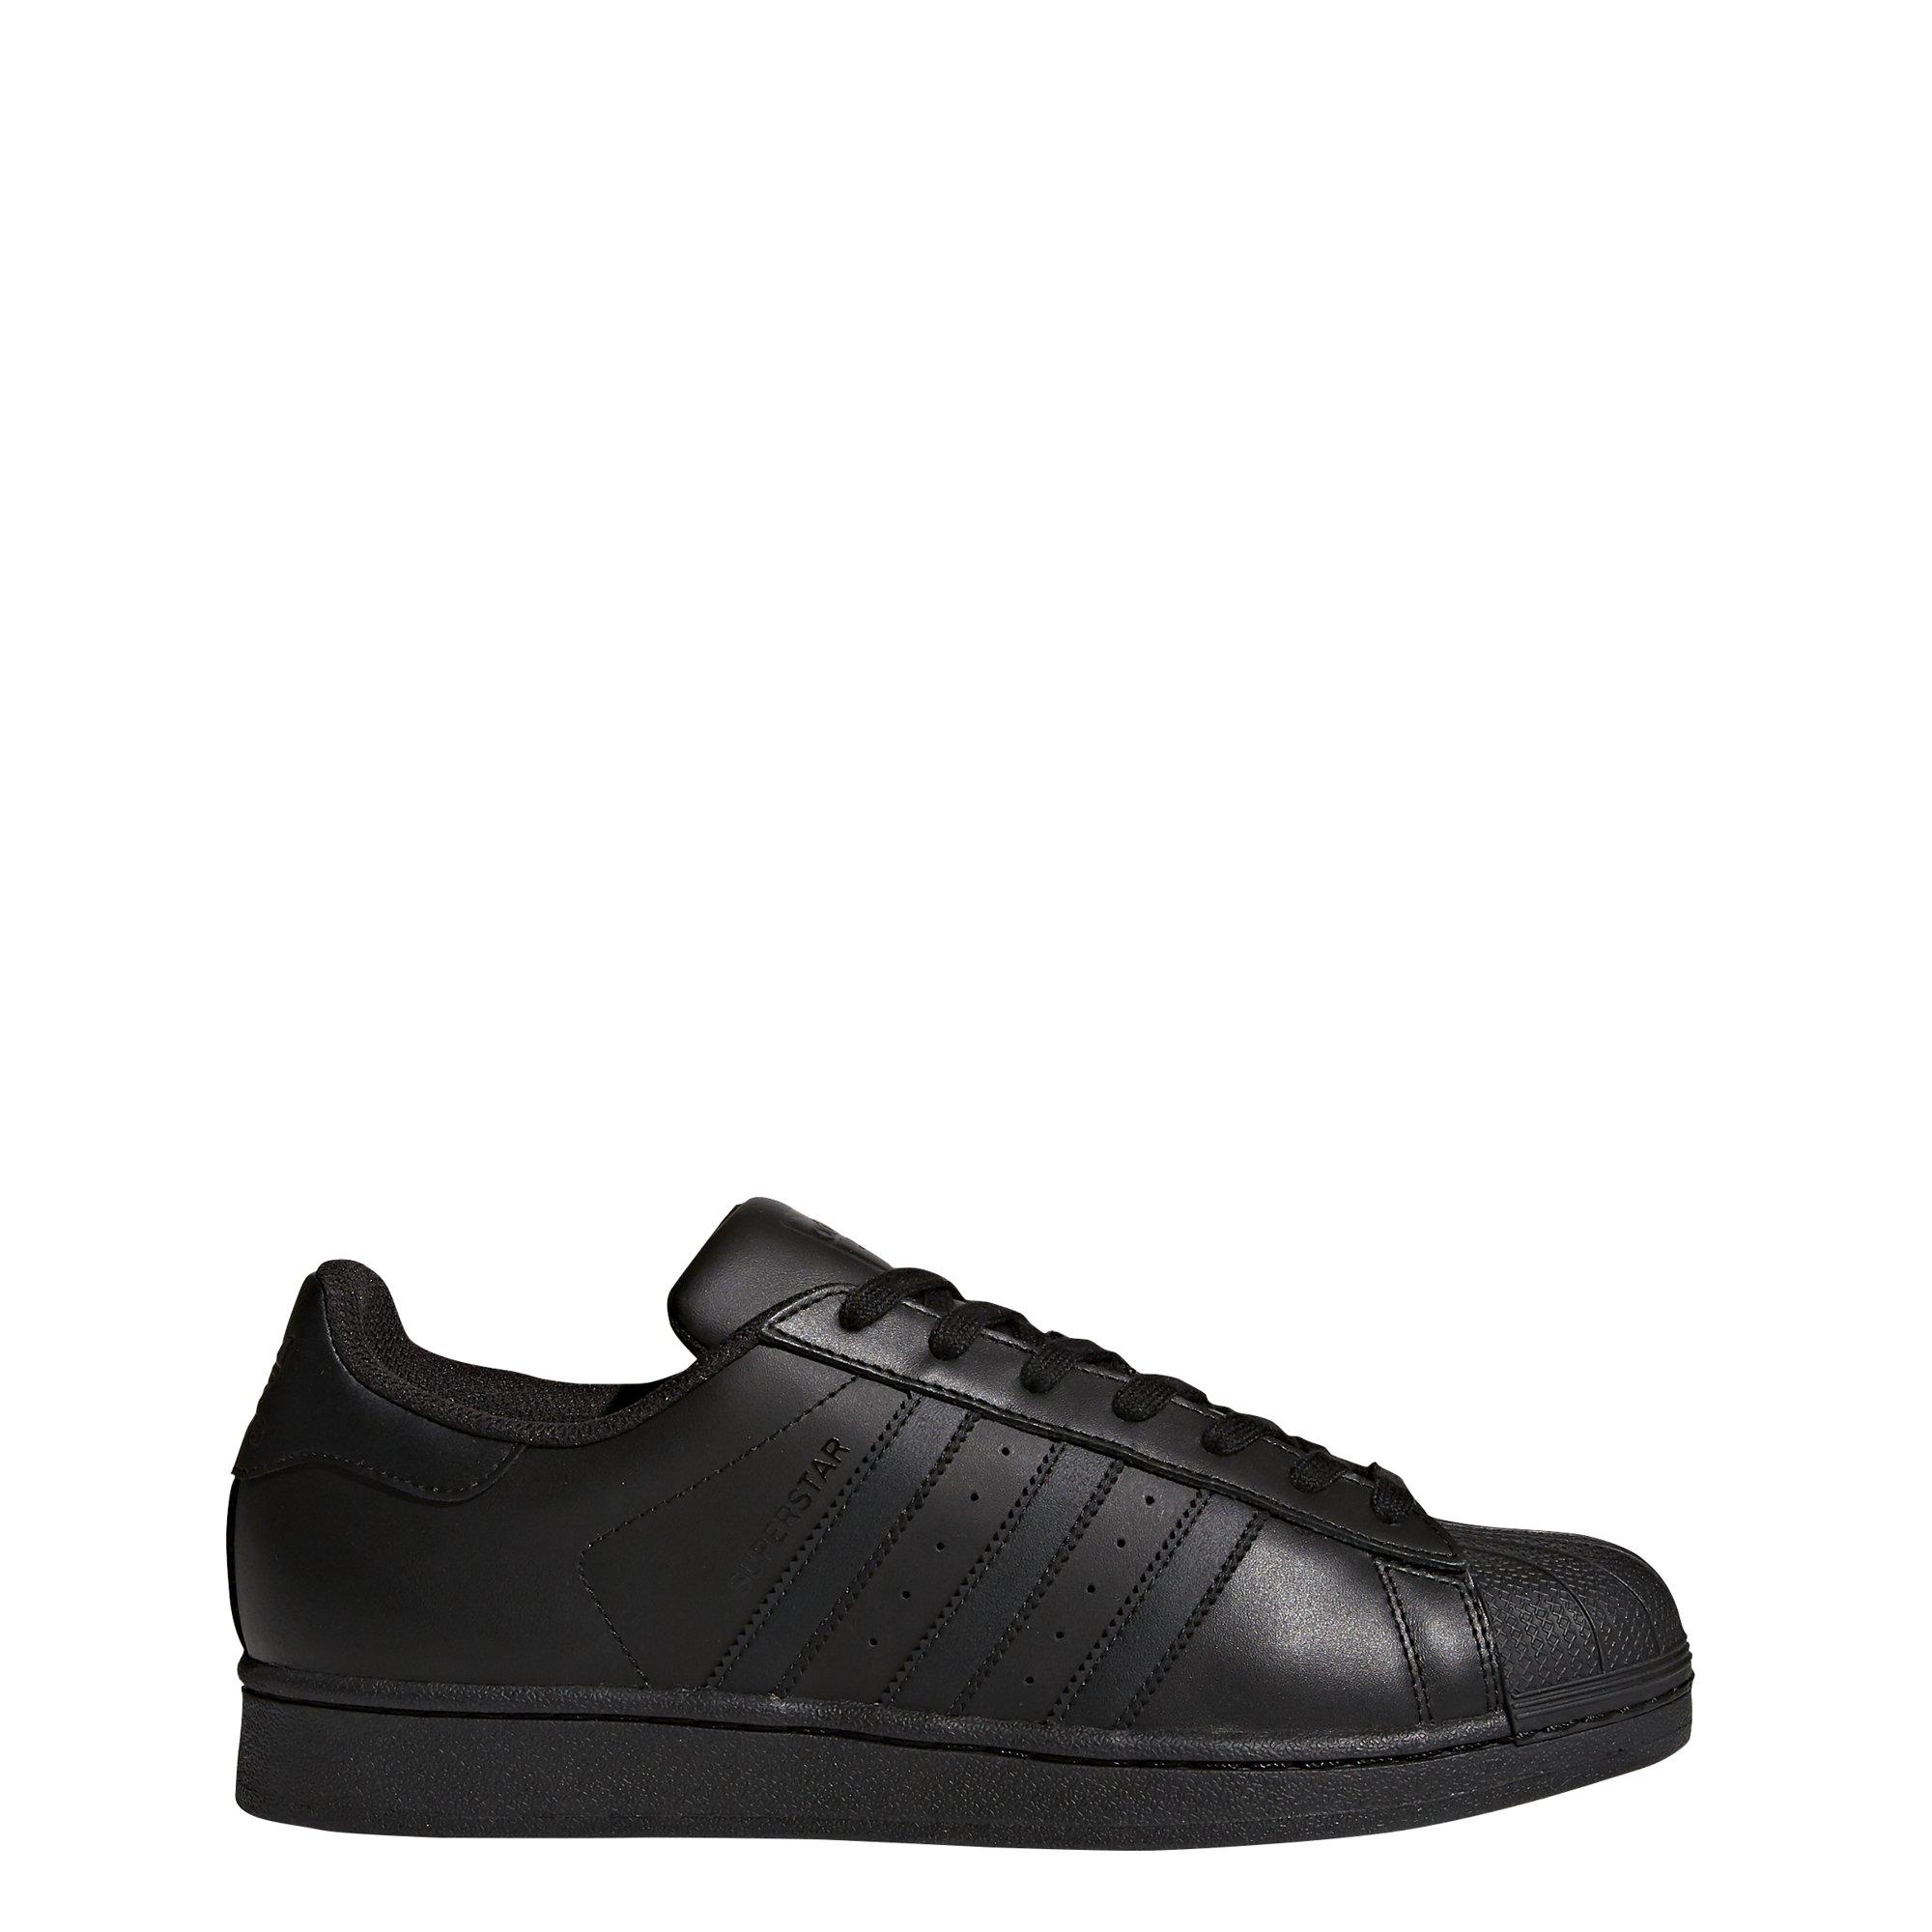 adidas Originals Men's Superstar Shoes, Black, 6 M US